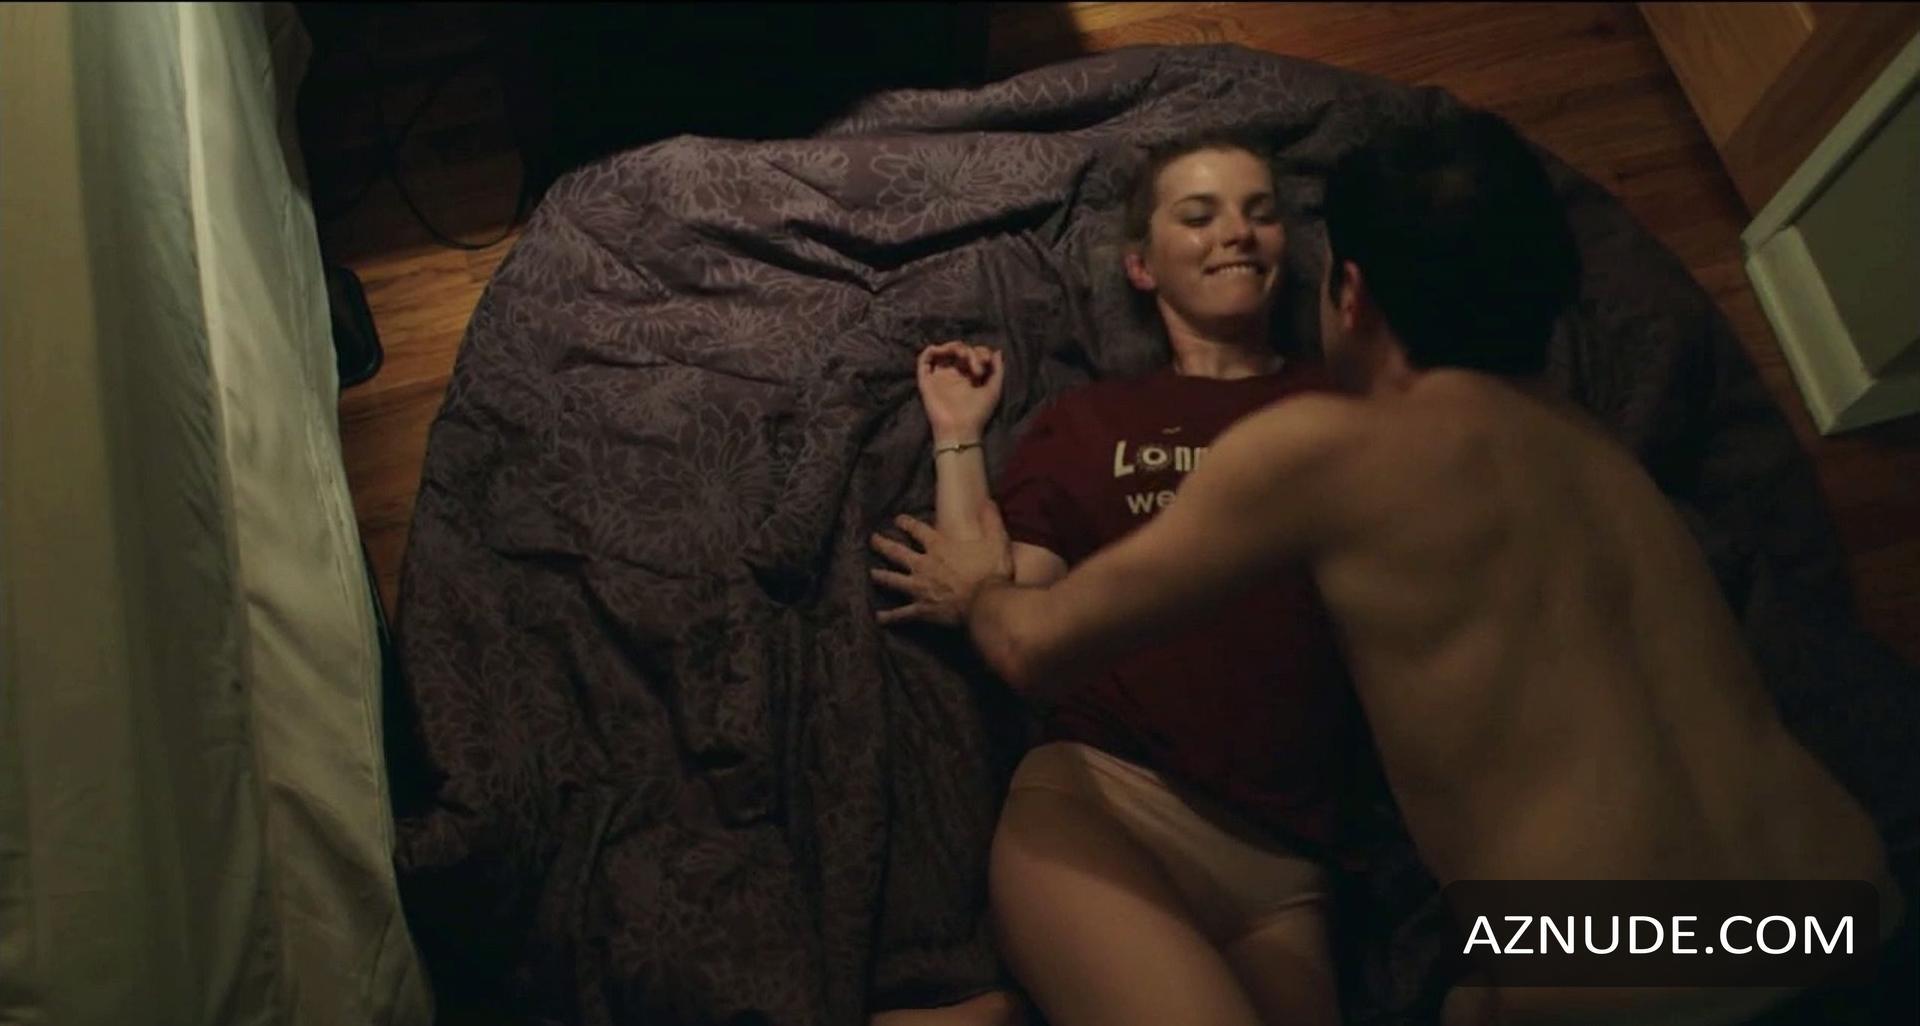 Peri gilpin sex tape